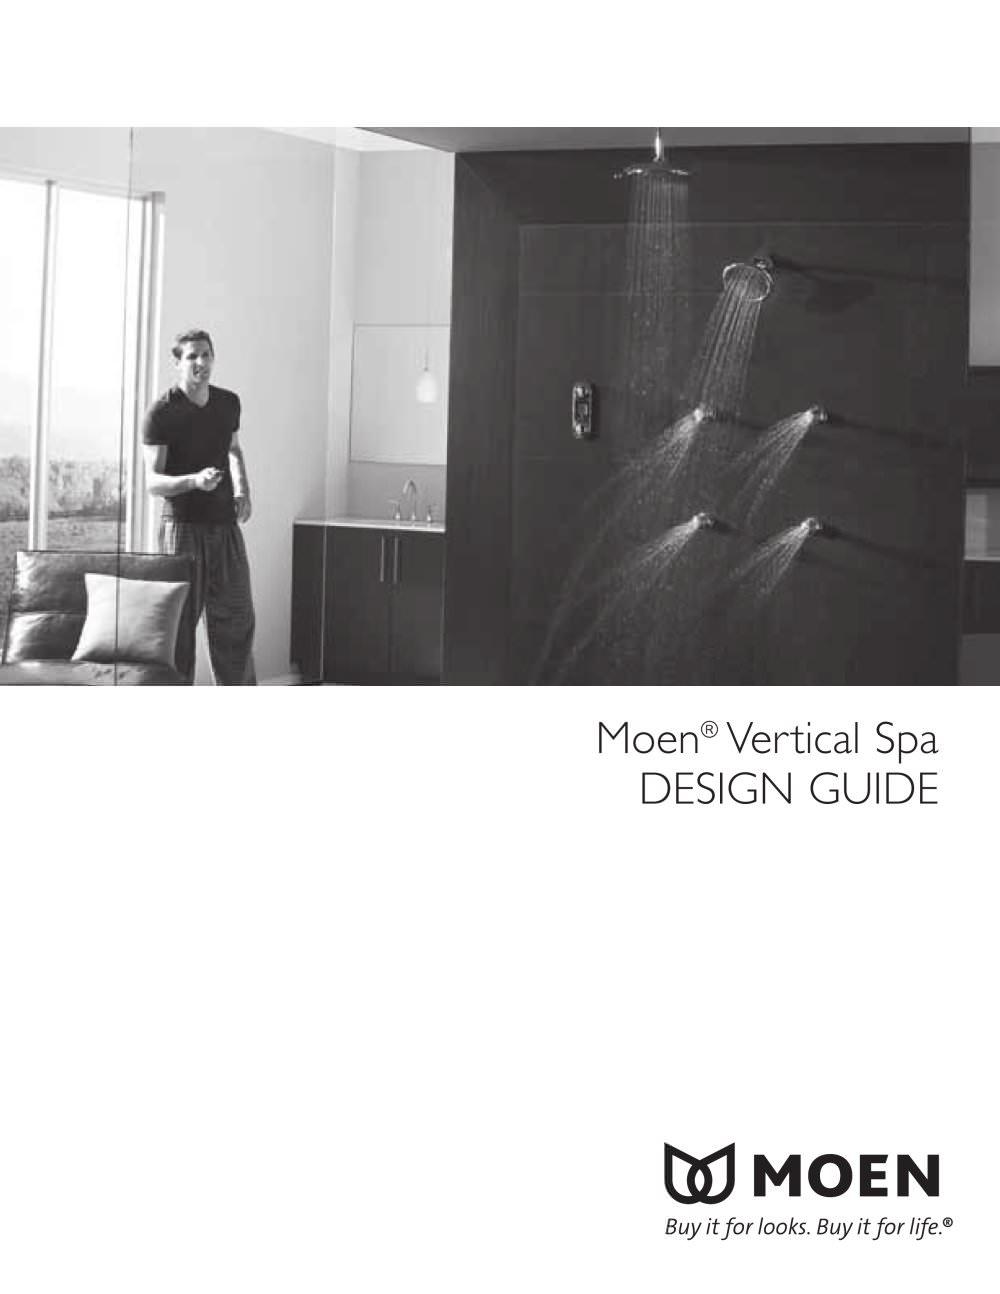 Moen® Vertical Spa DESIGN GUIDE - Moen - PDF Catalogues ...